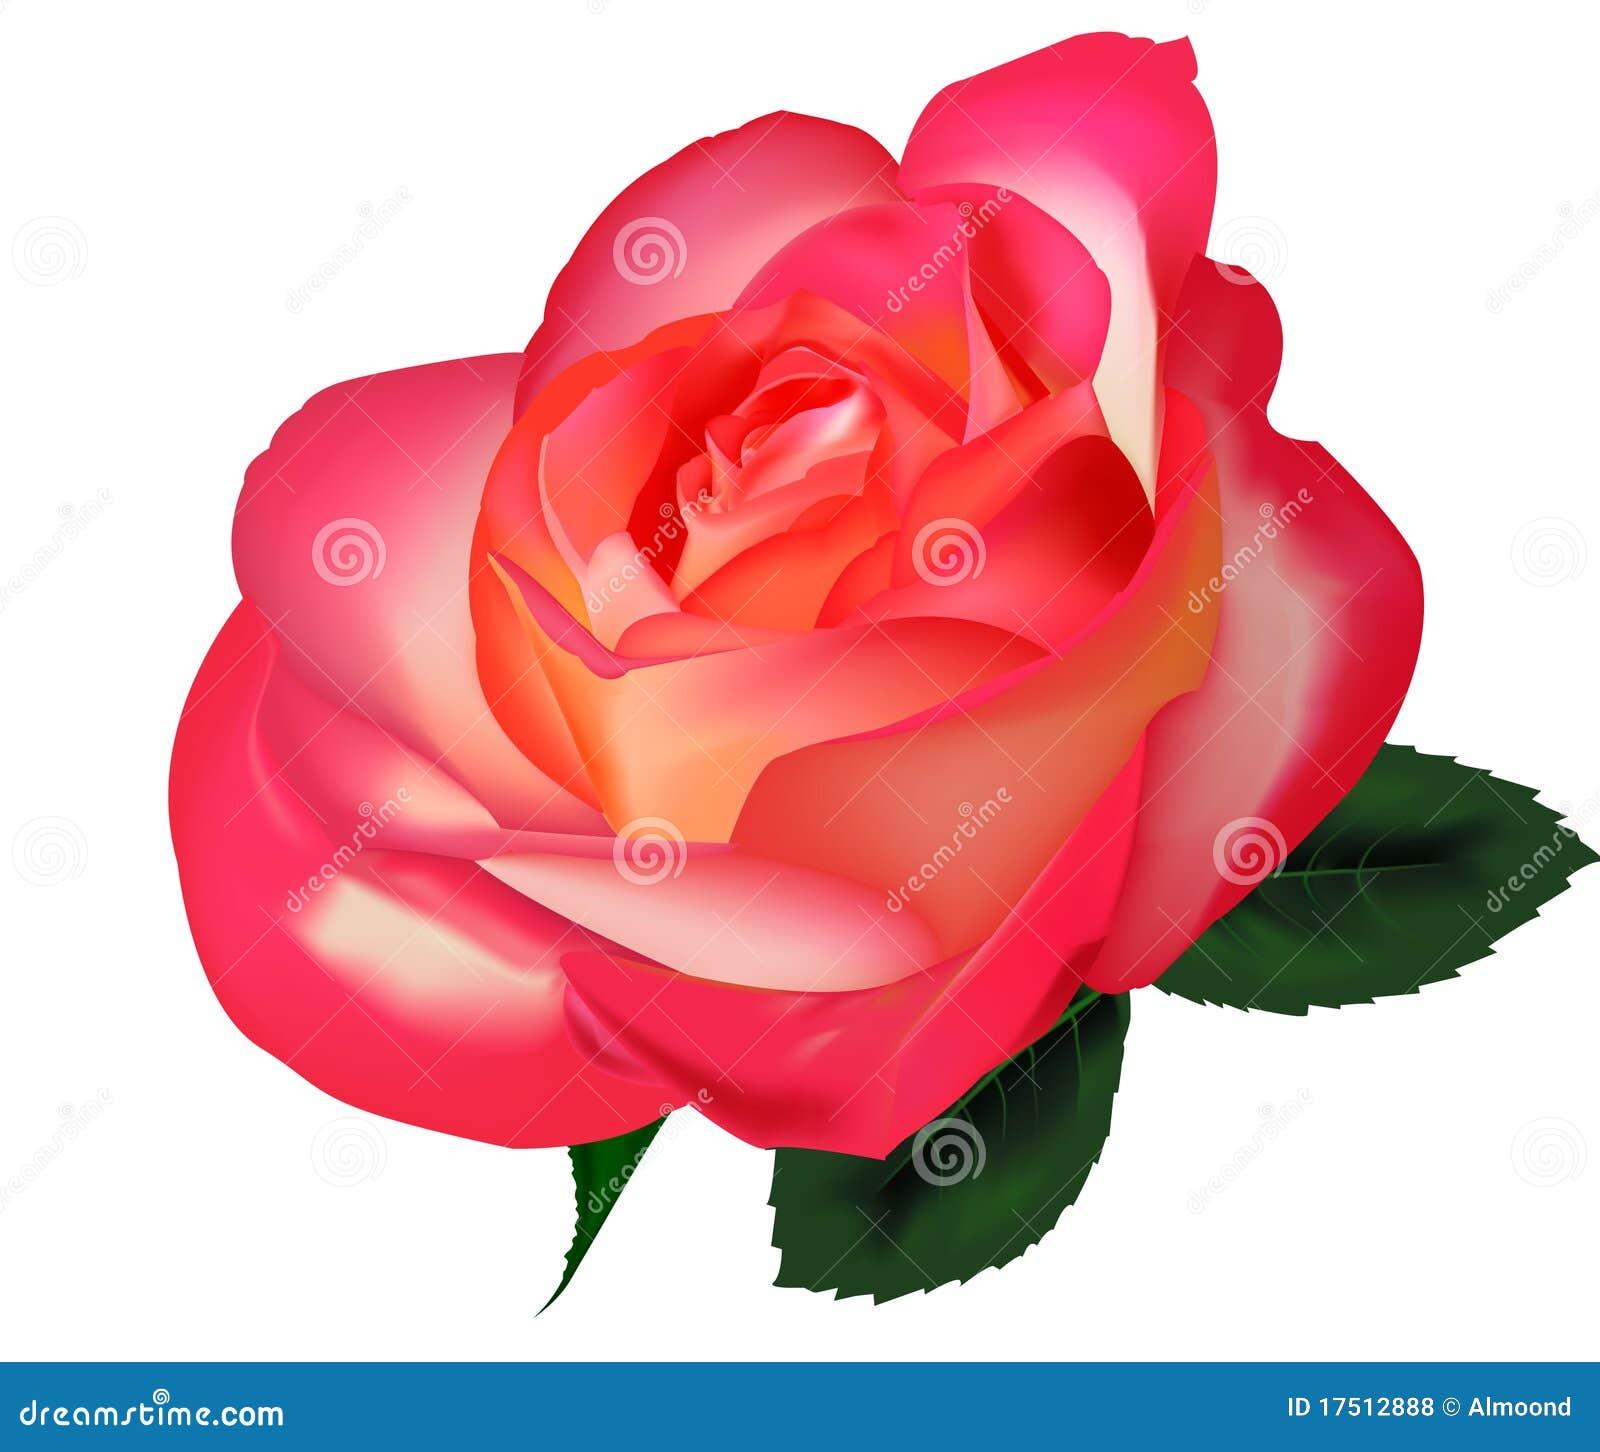 Beautiful Tea Rose On A White Background. Vector. Stock Illustration - Illustration of ...